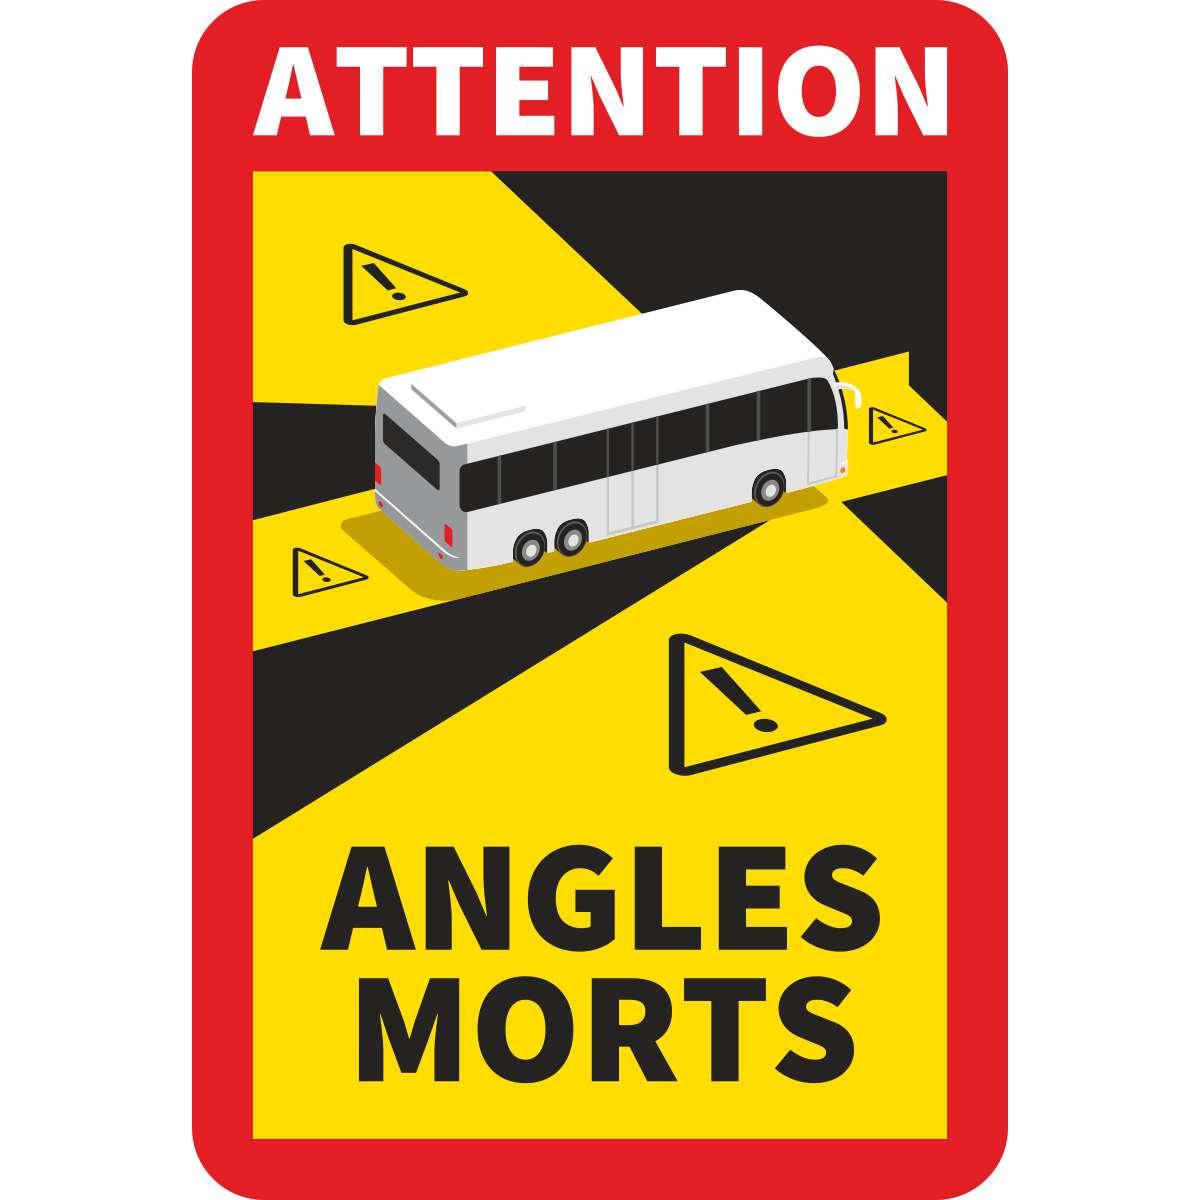 Toter Winkel - Aufkleber Frankreich ATTENTION ANGLES MORTS für Busse, Camper/Wohnmobile